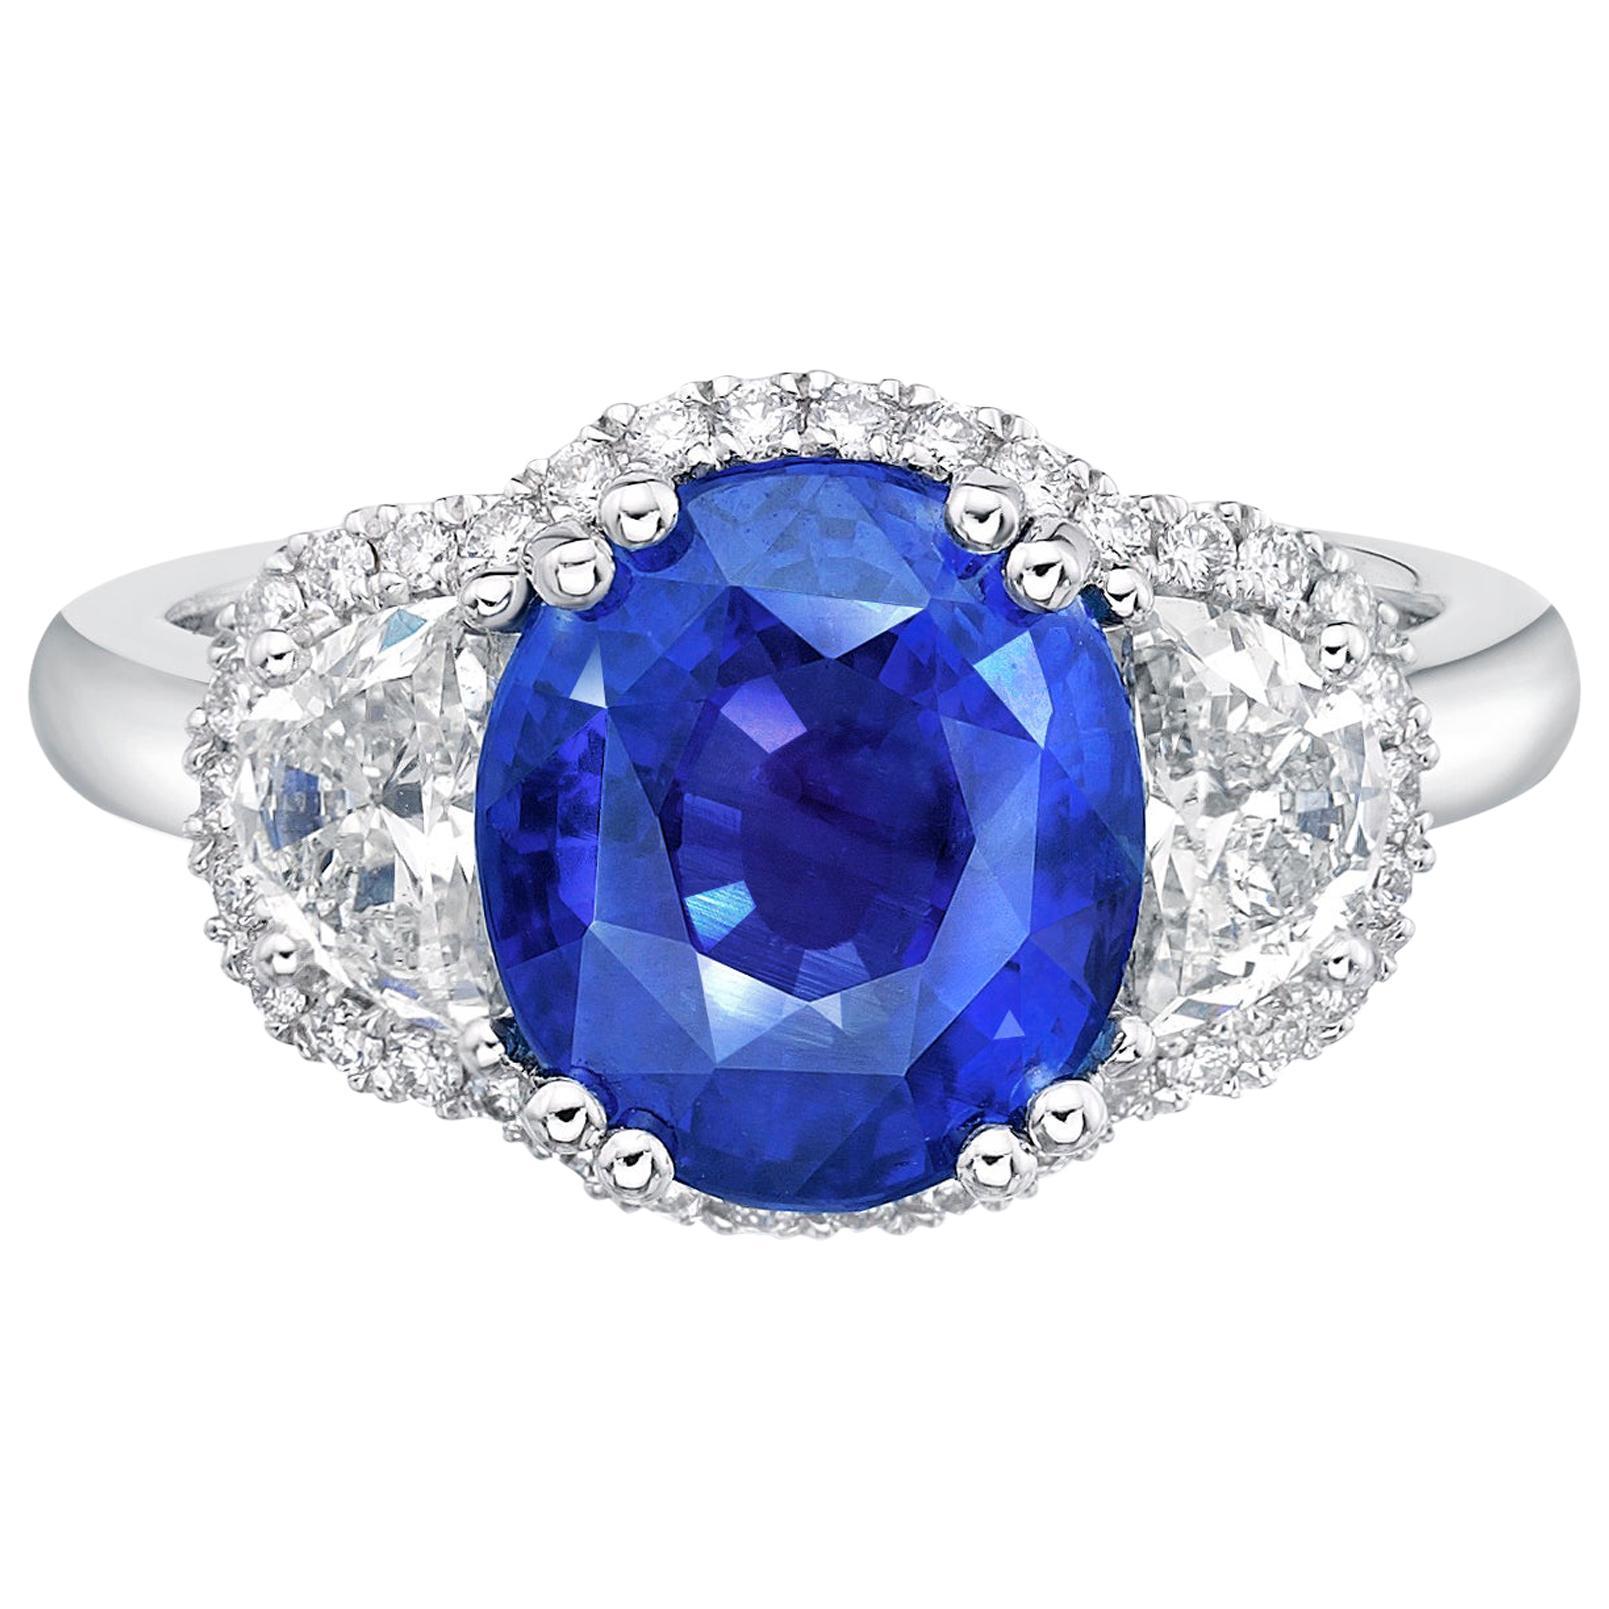 4.55 Carat Royal Blue Sapphire GRS Certified Unheated Diamond Ceylon Ring Oval